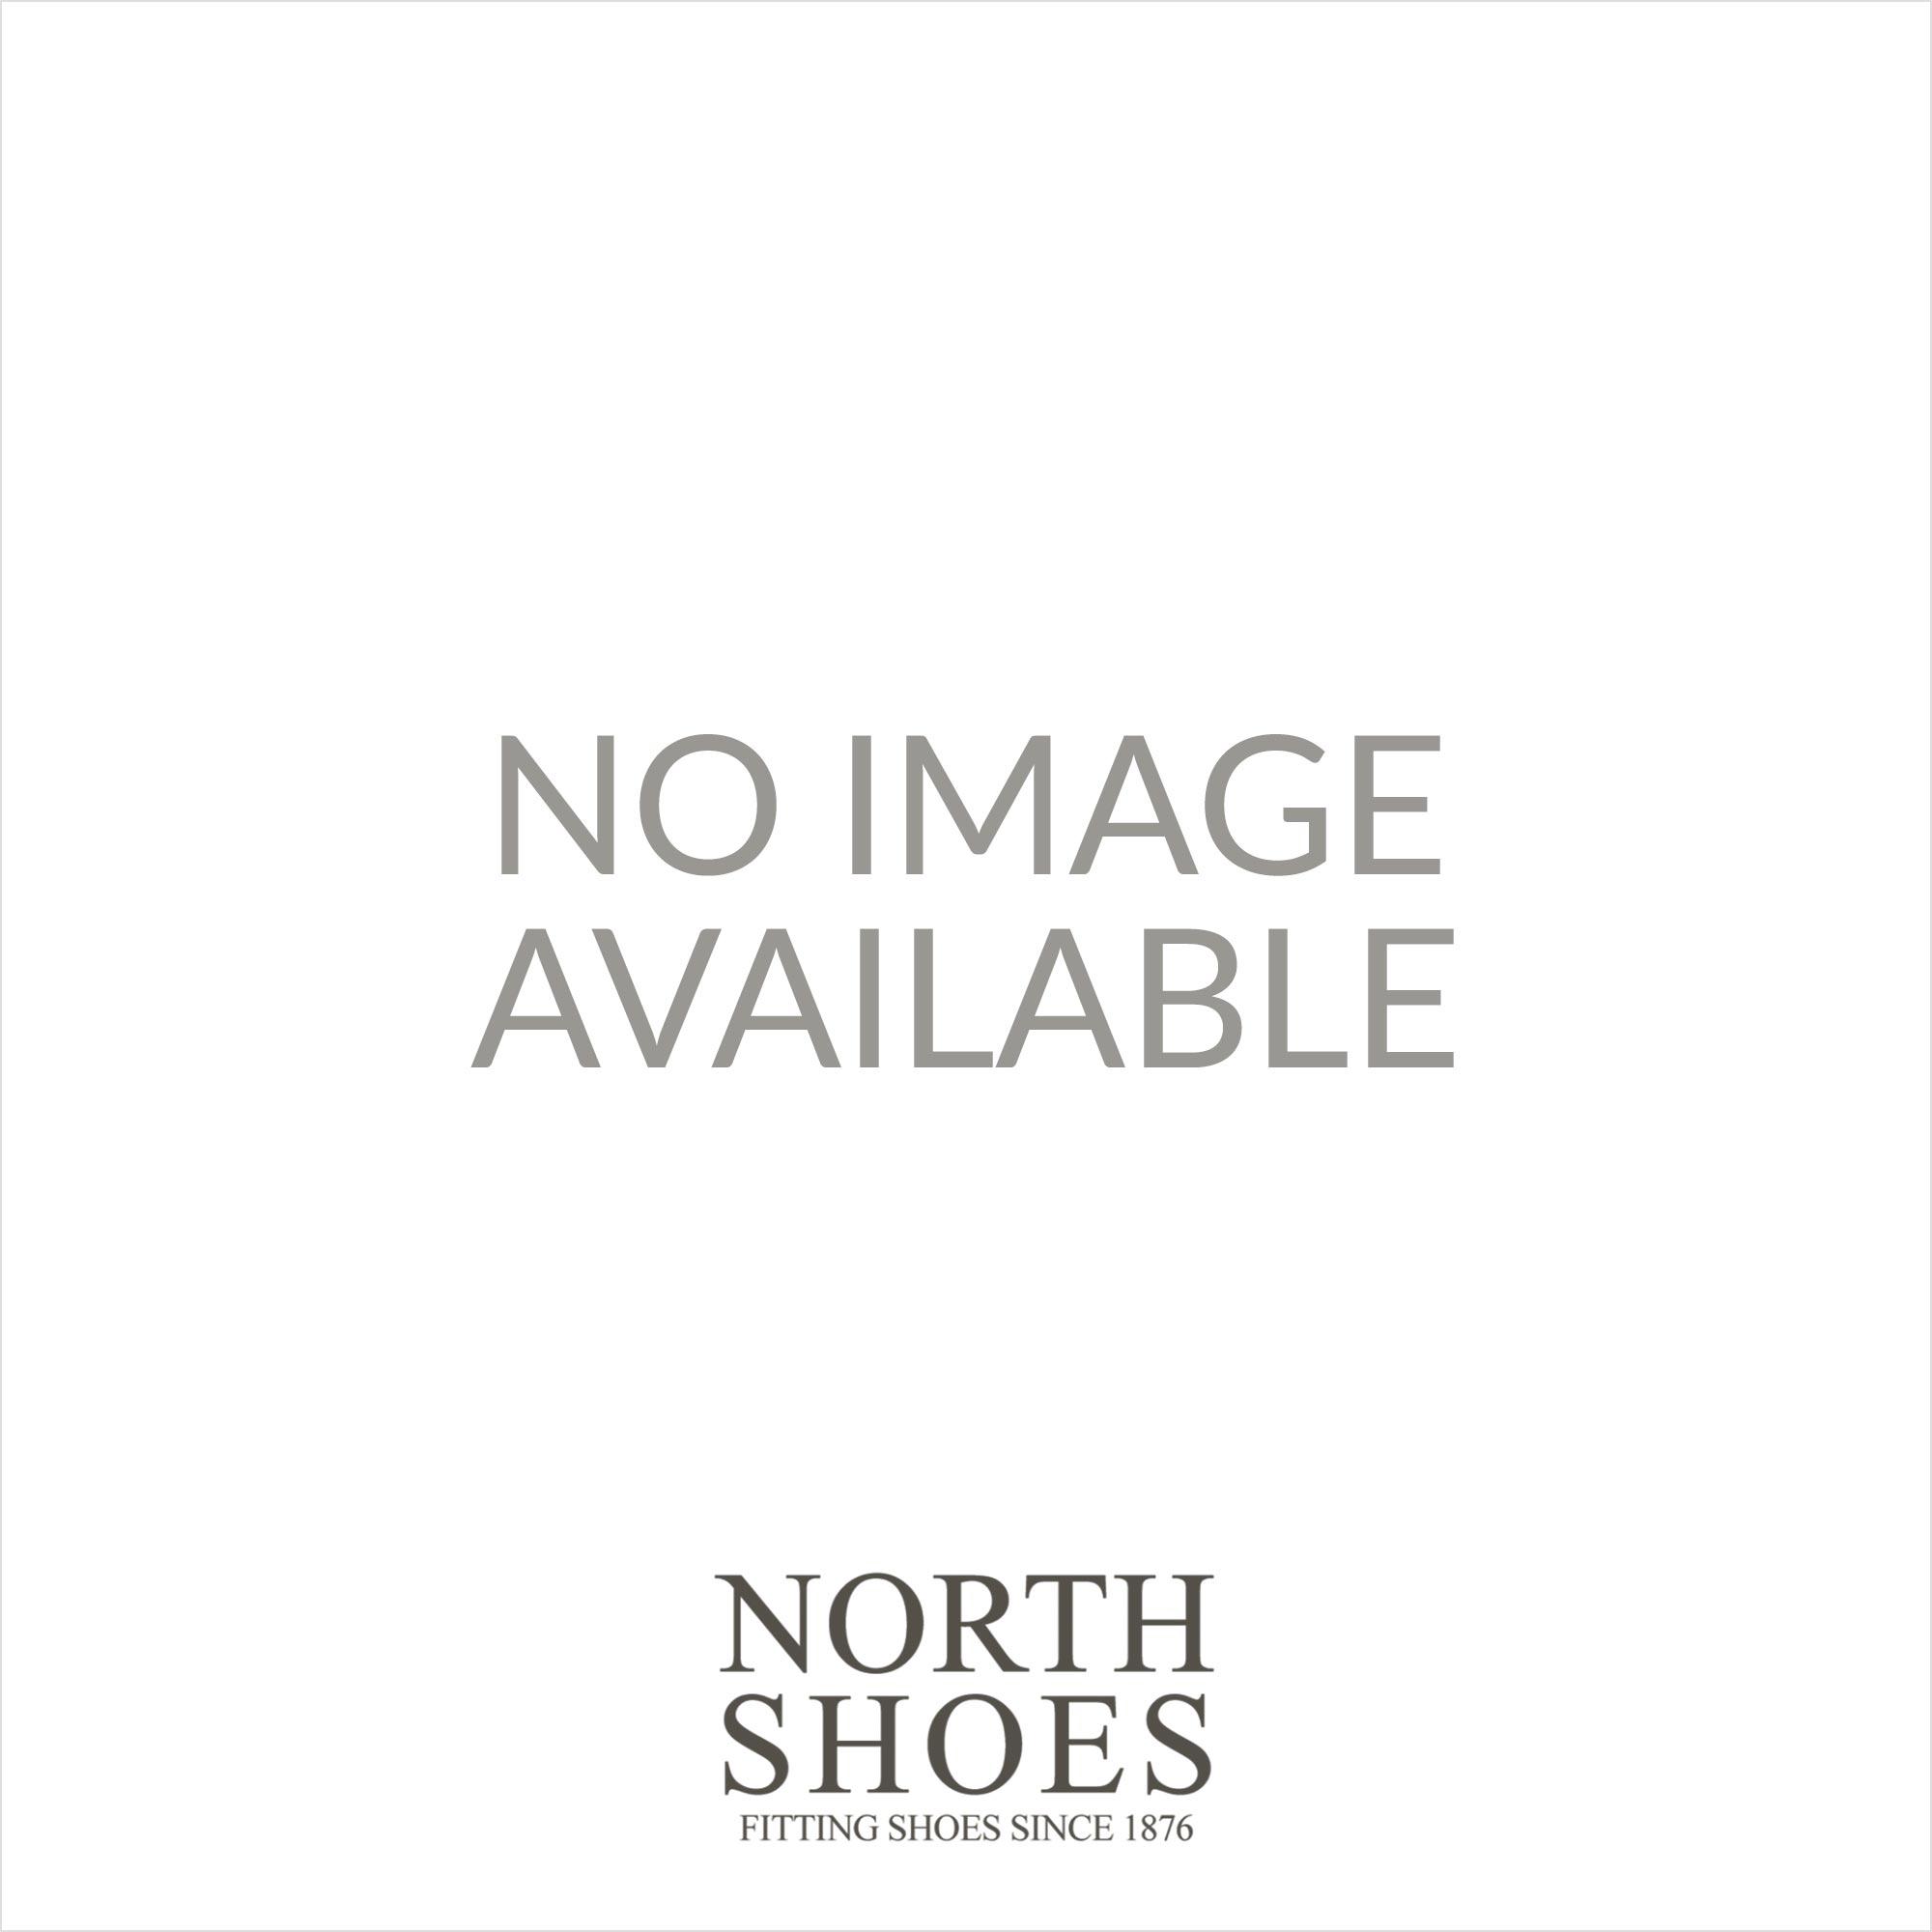 Fiji Tan Womens Leather Womens Slip On Shoes